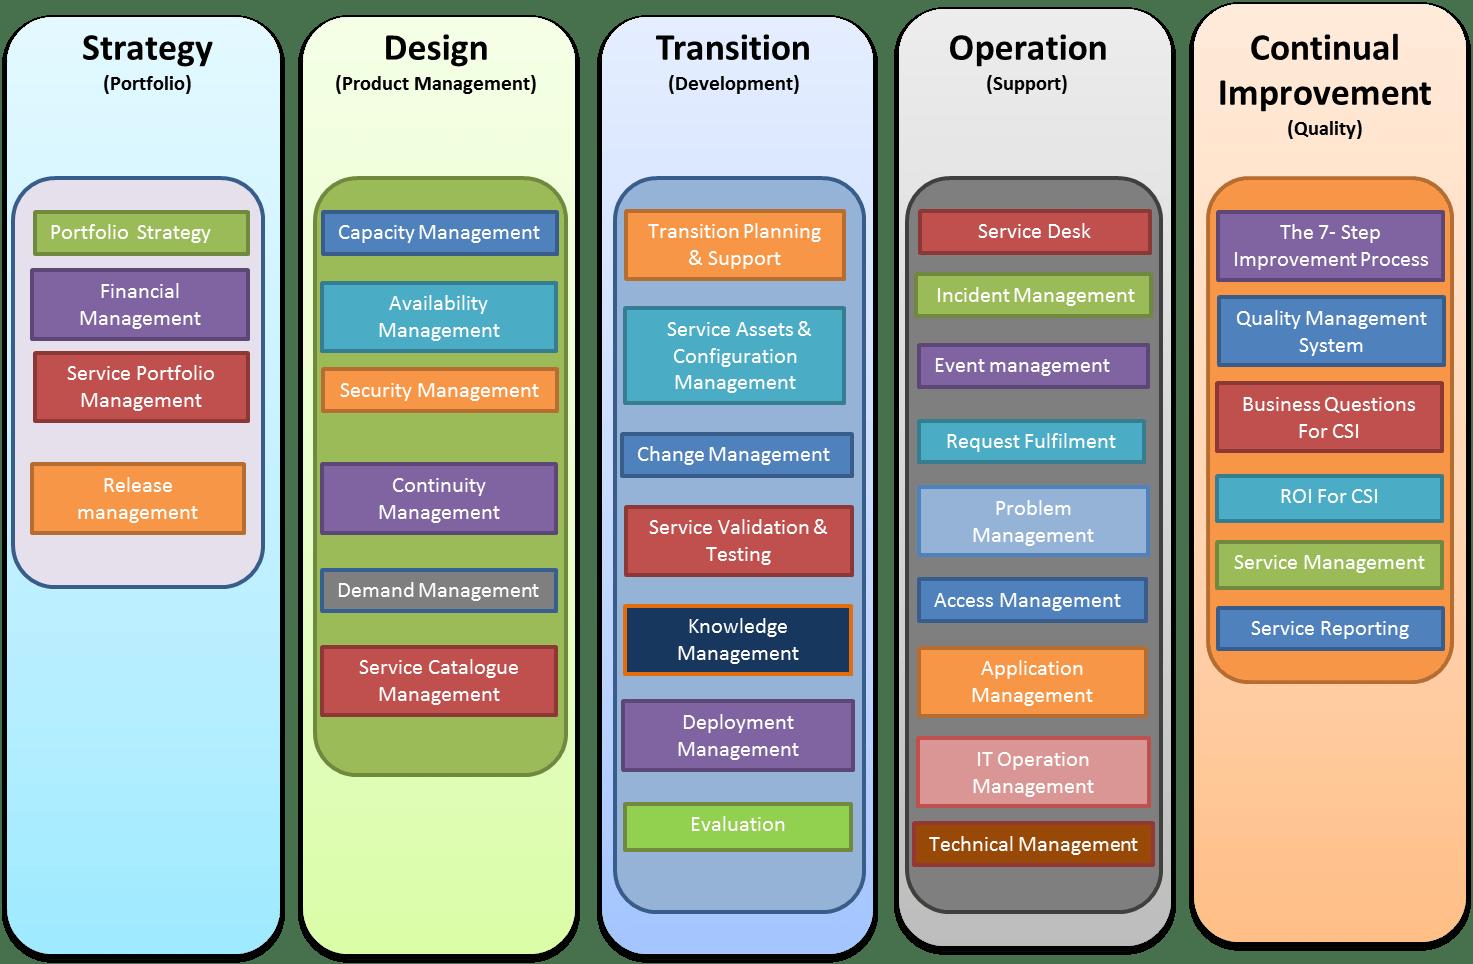 itil processes diagram convert image to visio wikipedia